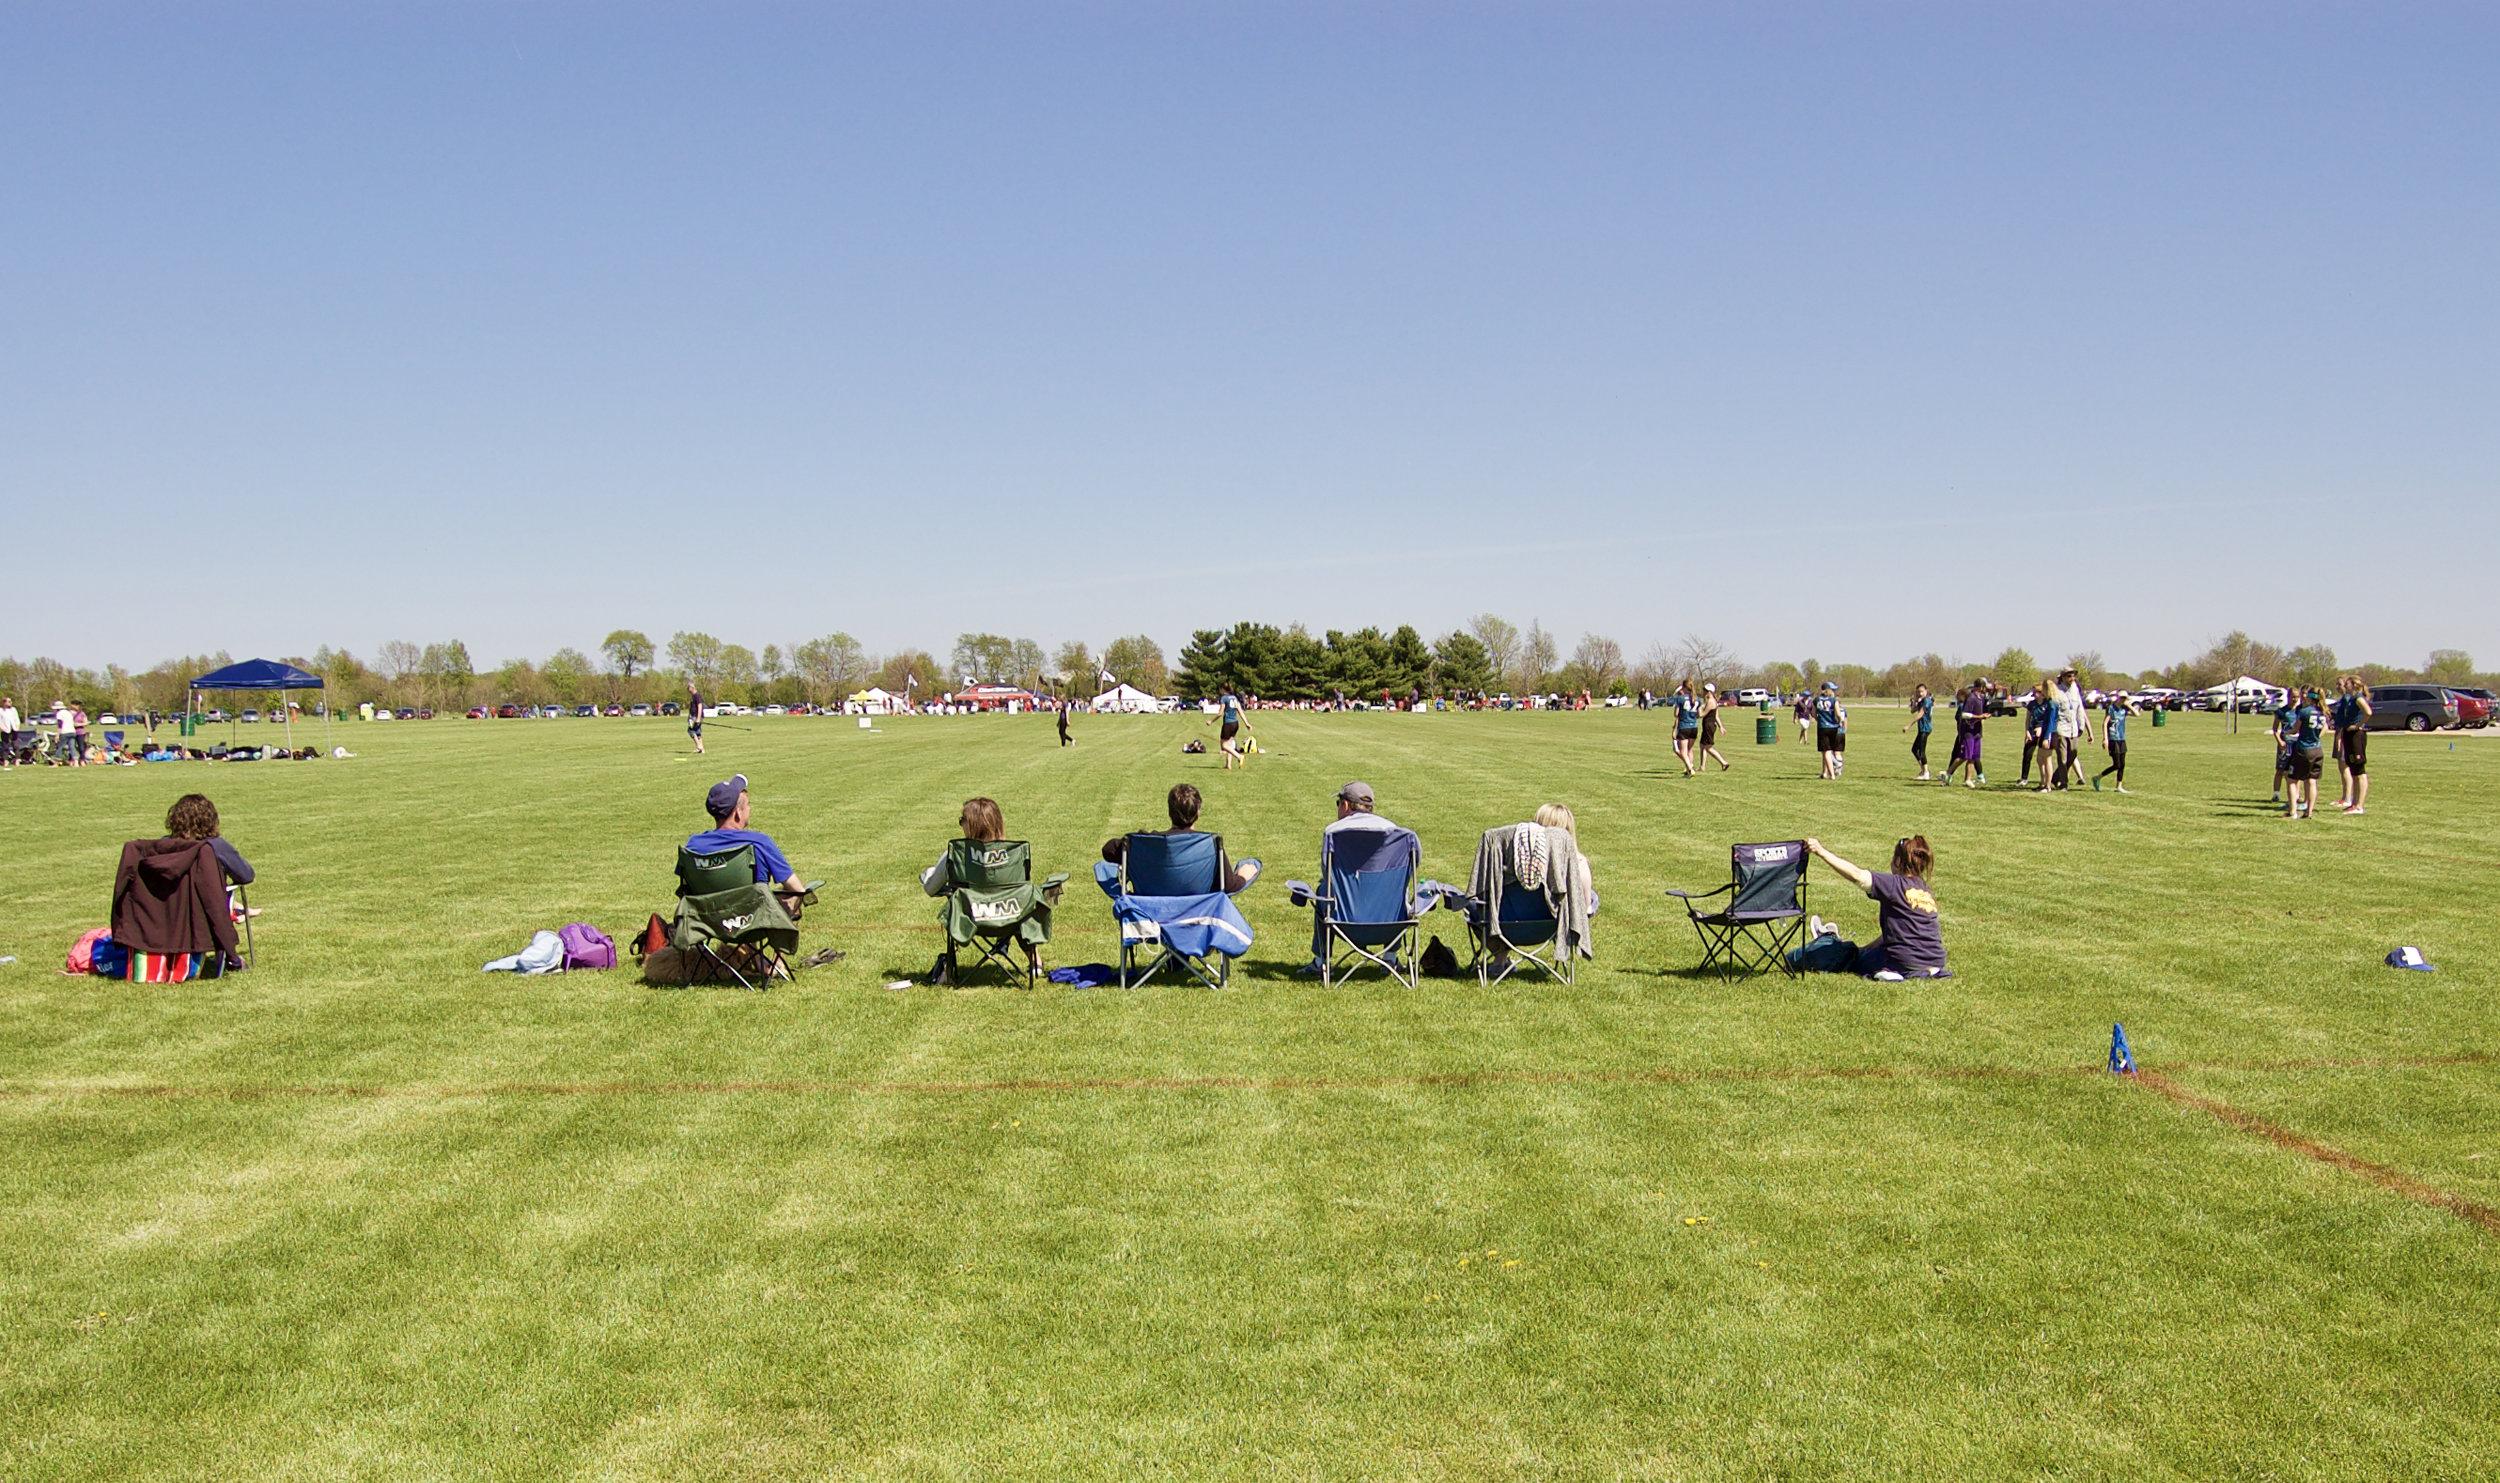 Folding Chairs. Stuarts Sports Complex. Montgomery, Illinois. April 2017. © William D. Walker